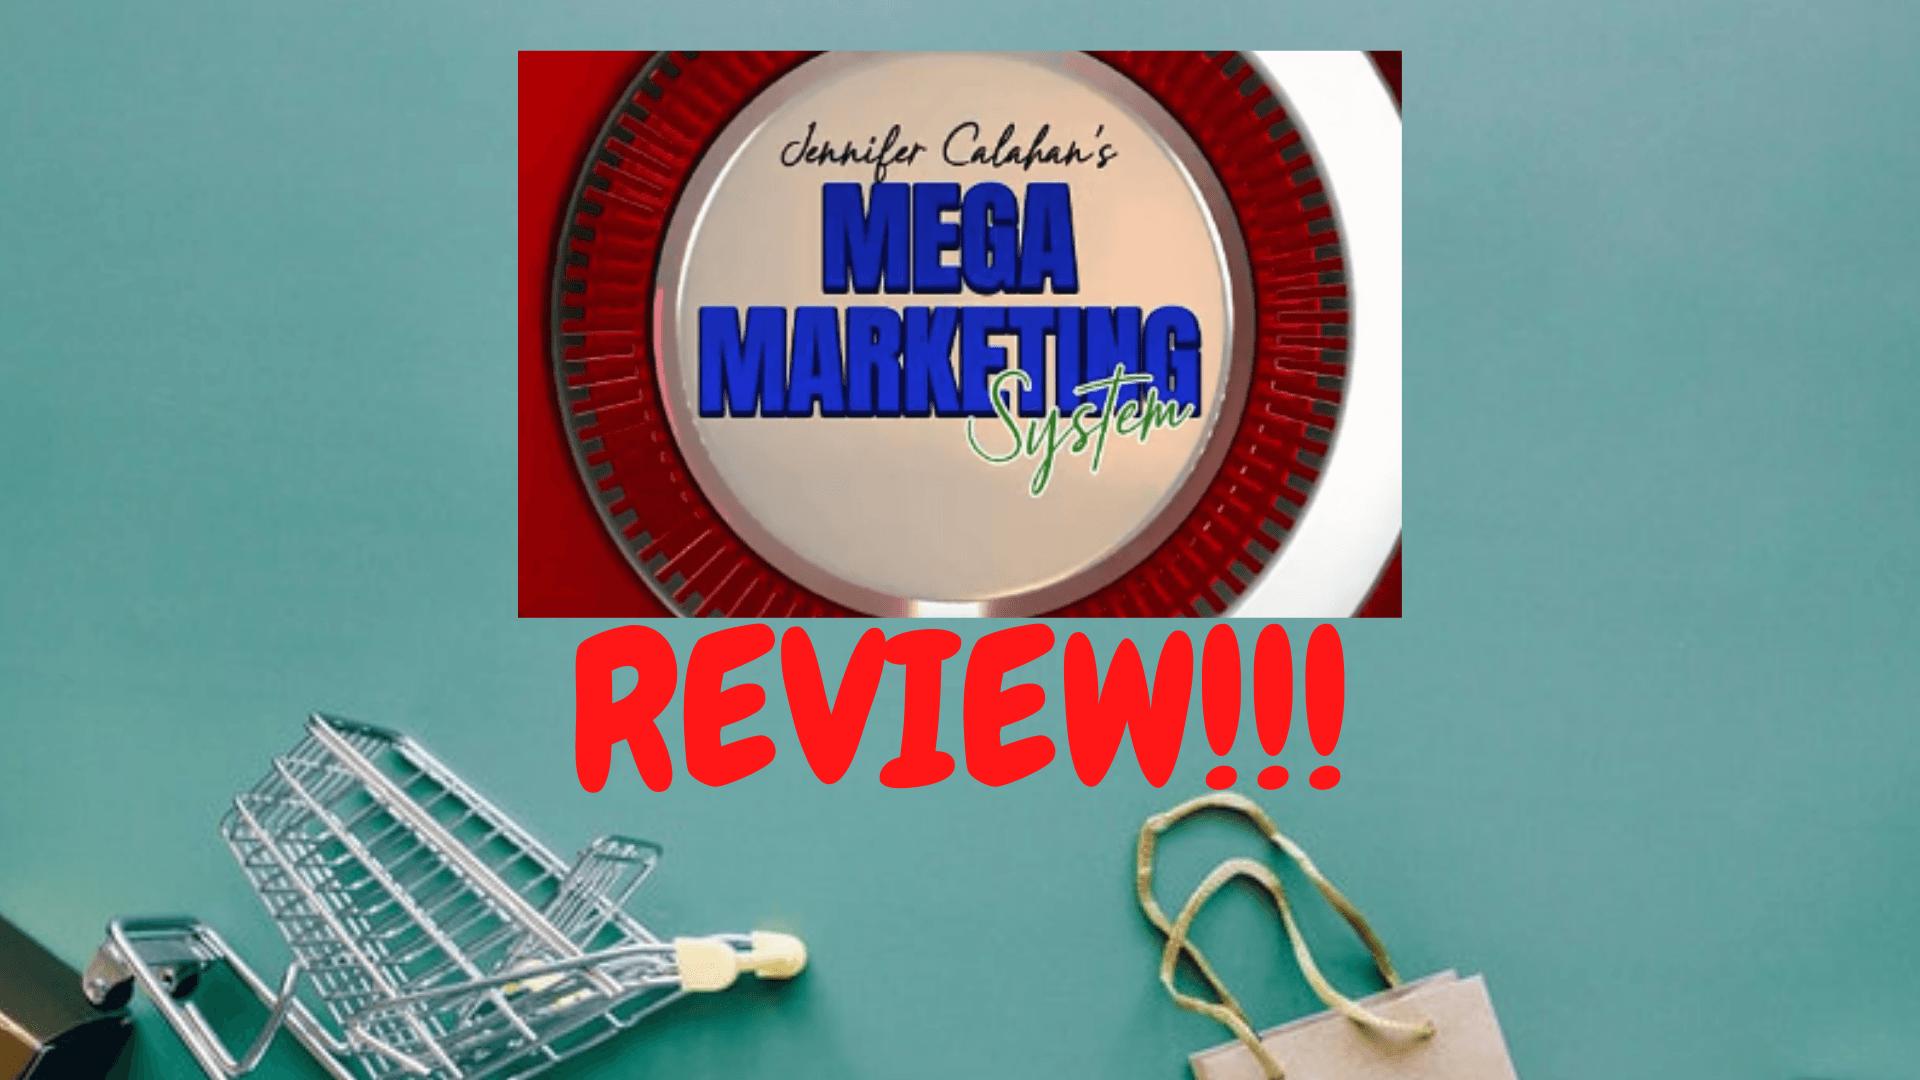 Mega Marketing System Front Page